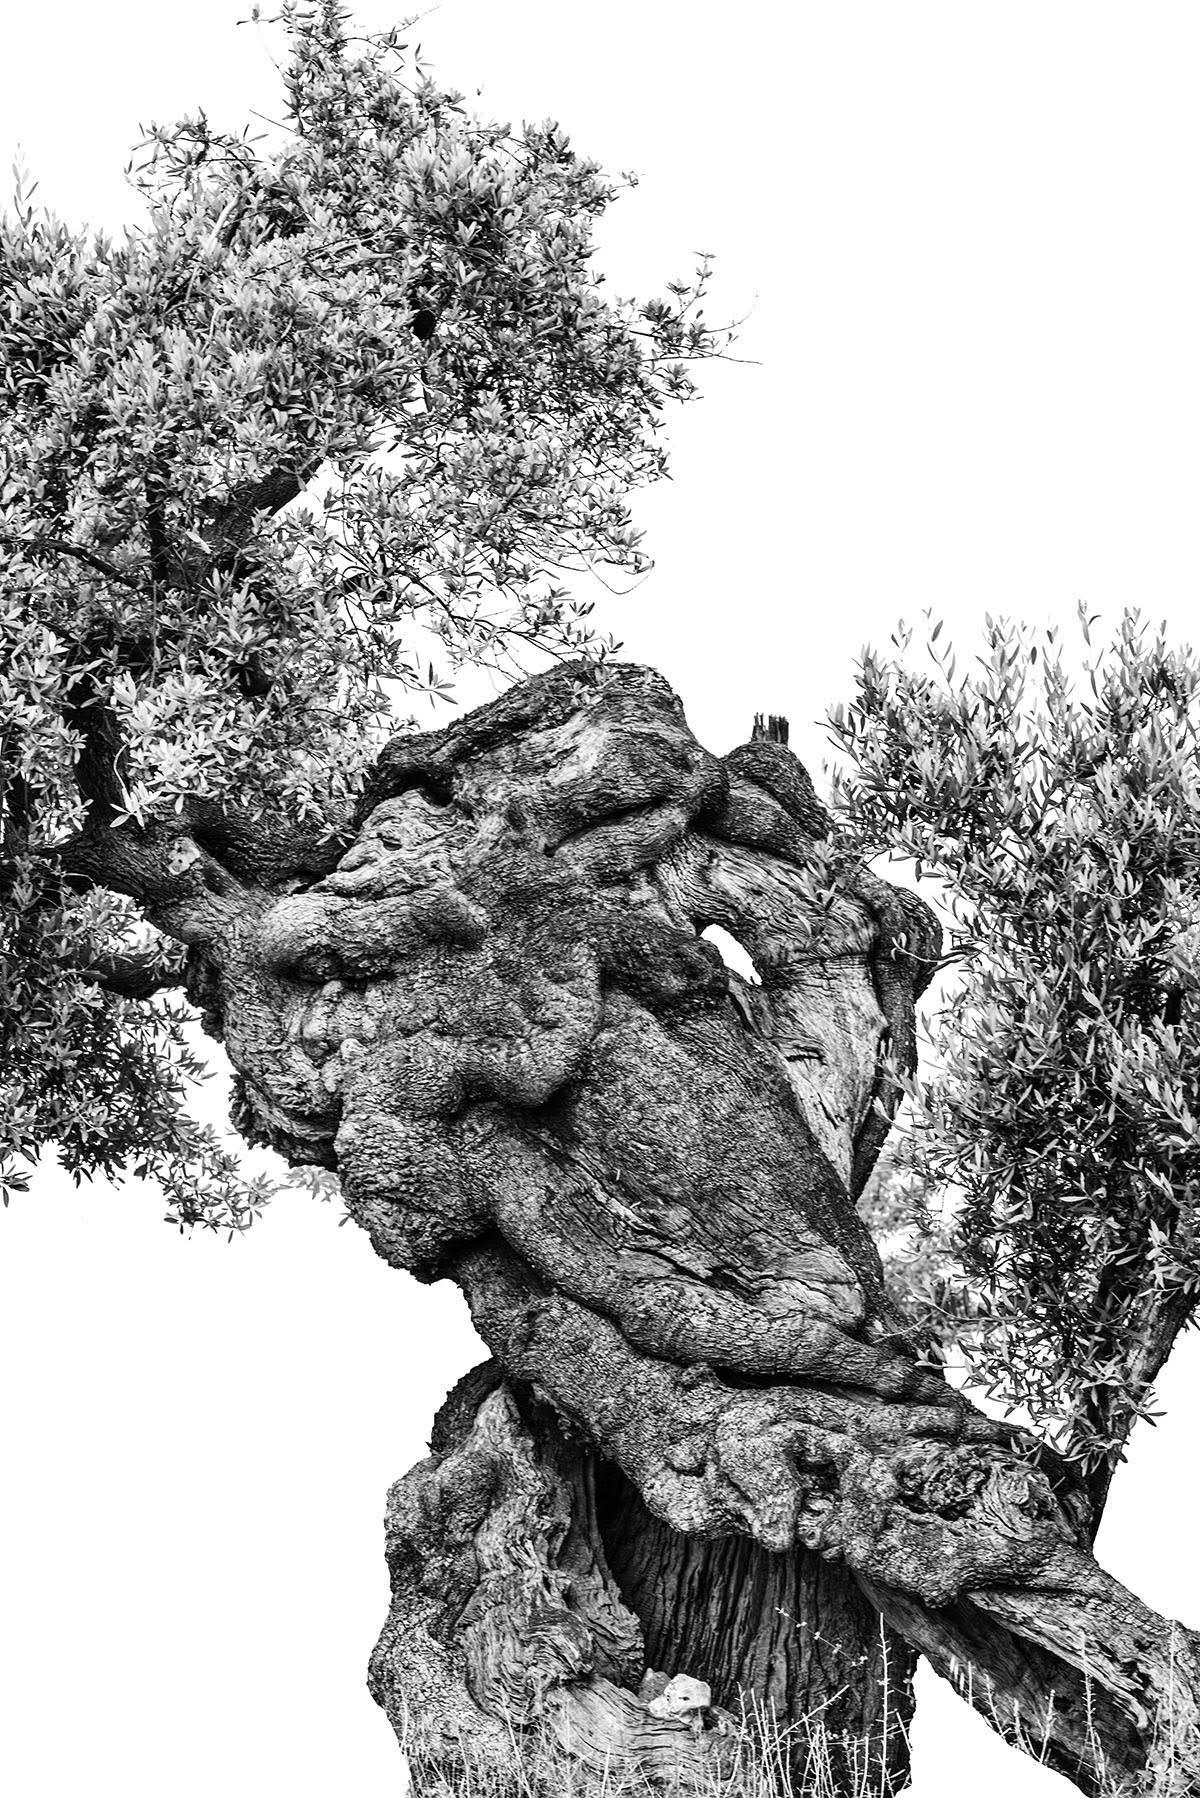 martin-ogolter-Monumentali-nature-landscape-photographer-17